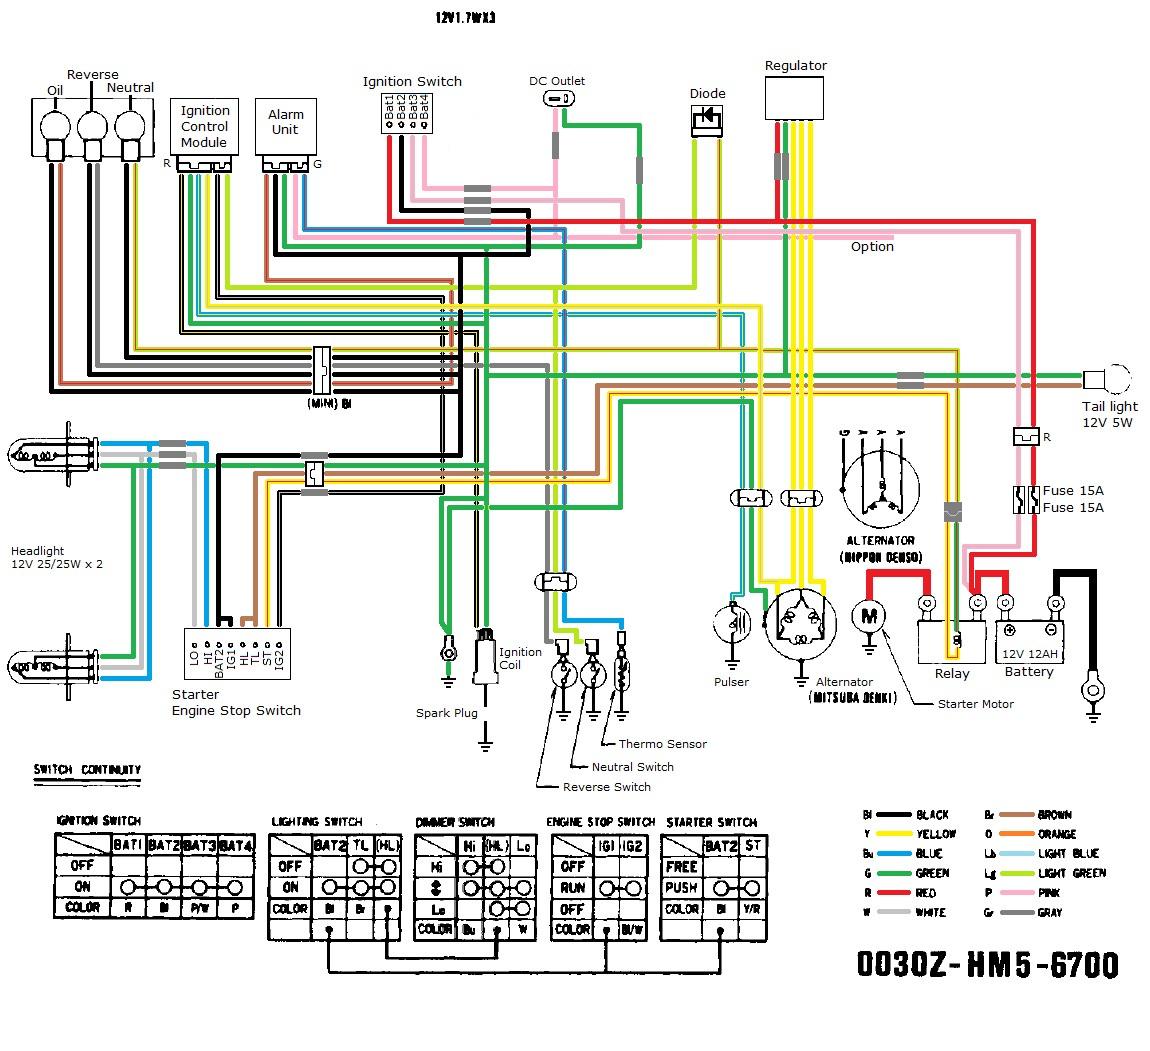 4 Wire Cdi Chinese Atv Wiring Diagrams 110cc Early Ford Alternator Wiring Diagram Duramaxxx Yenpancane Jeanjaures37 Fr